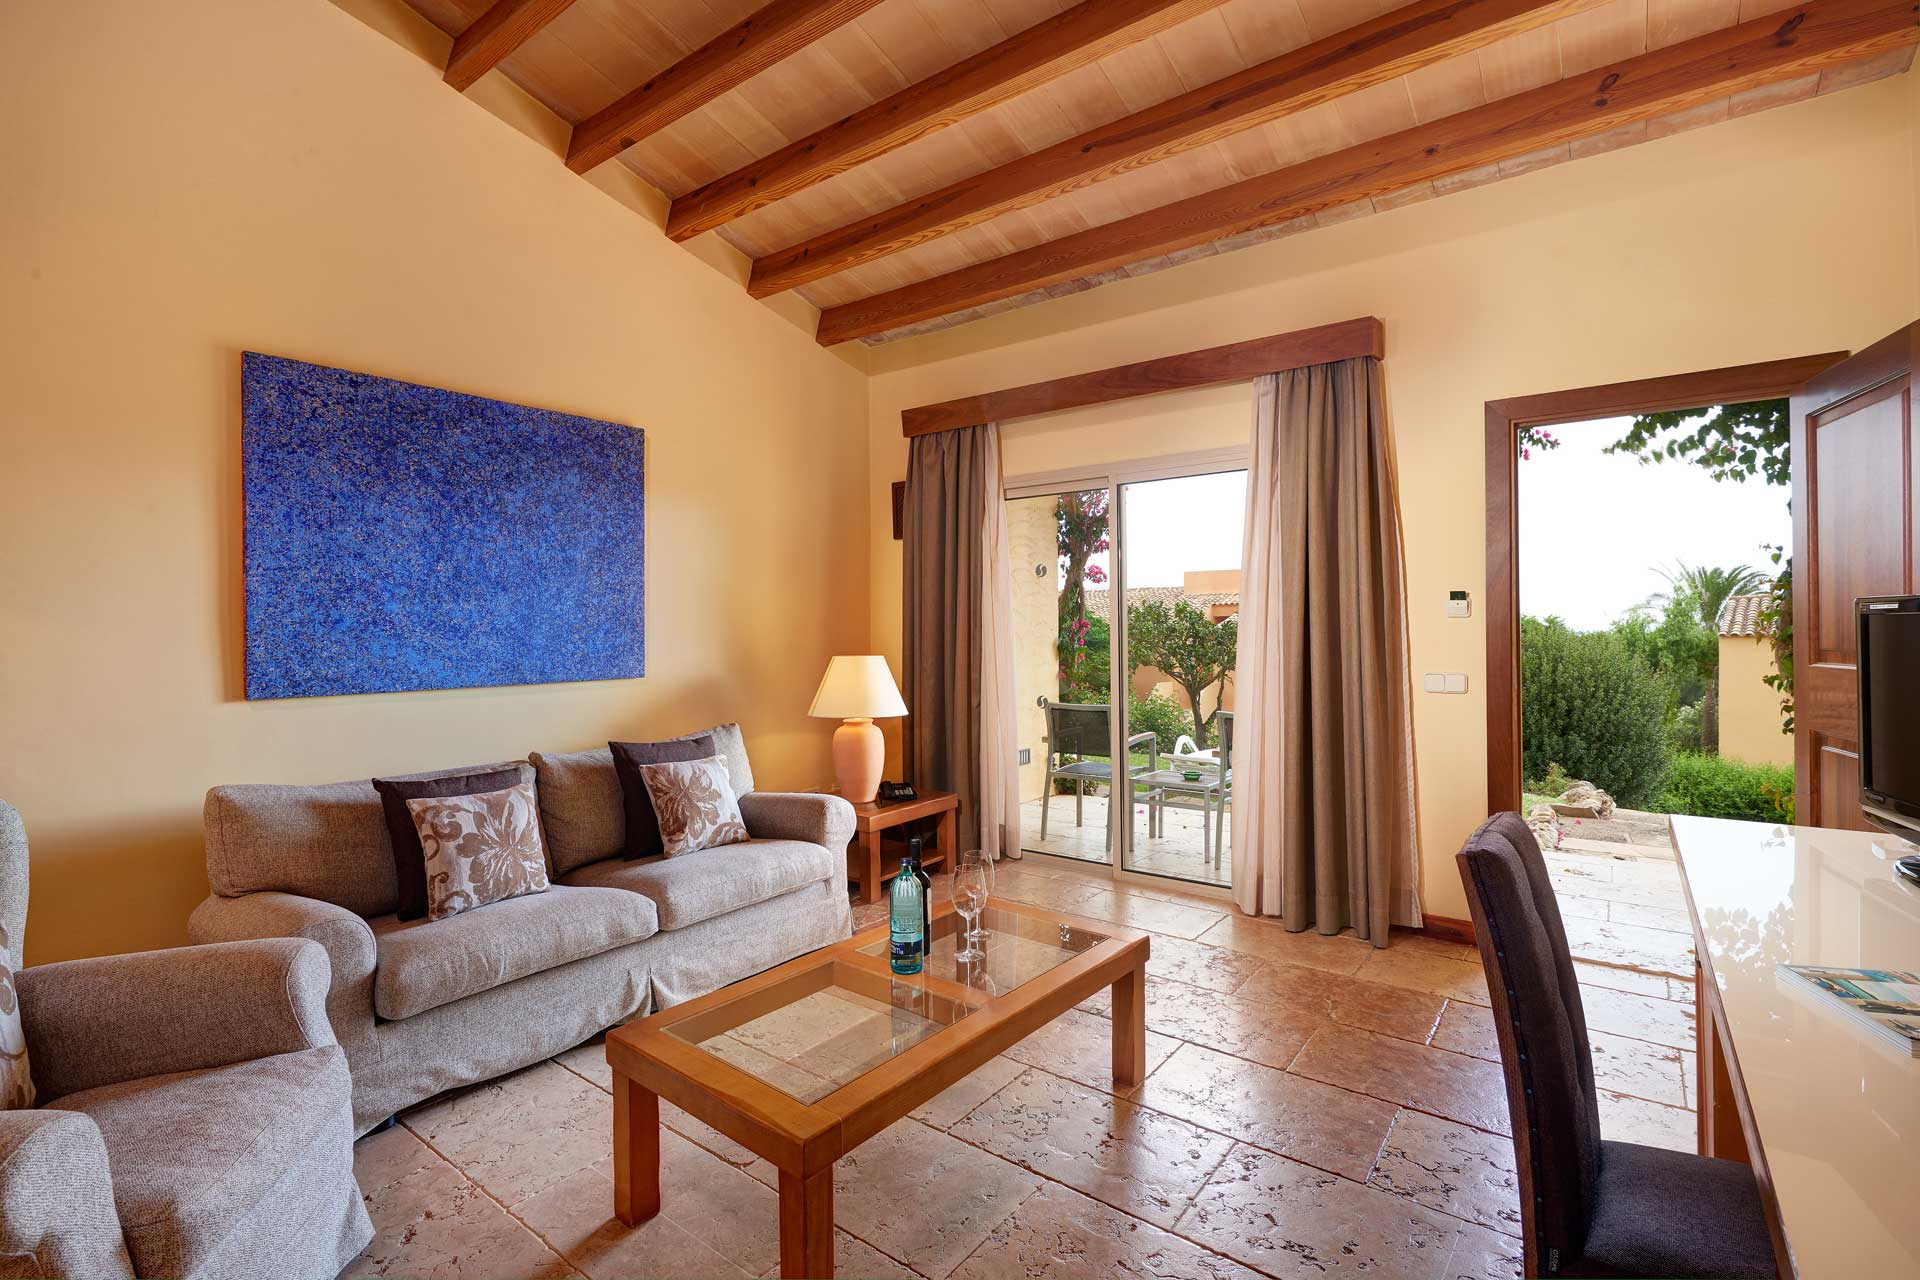 Finca-Hotel Sentido Pula Suites - Standard Suite living room